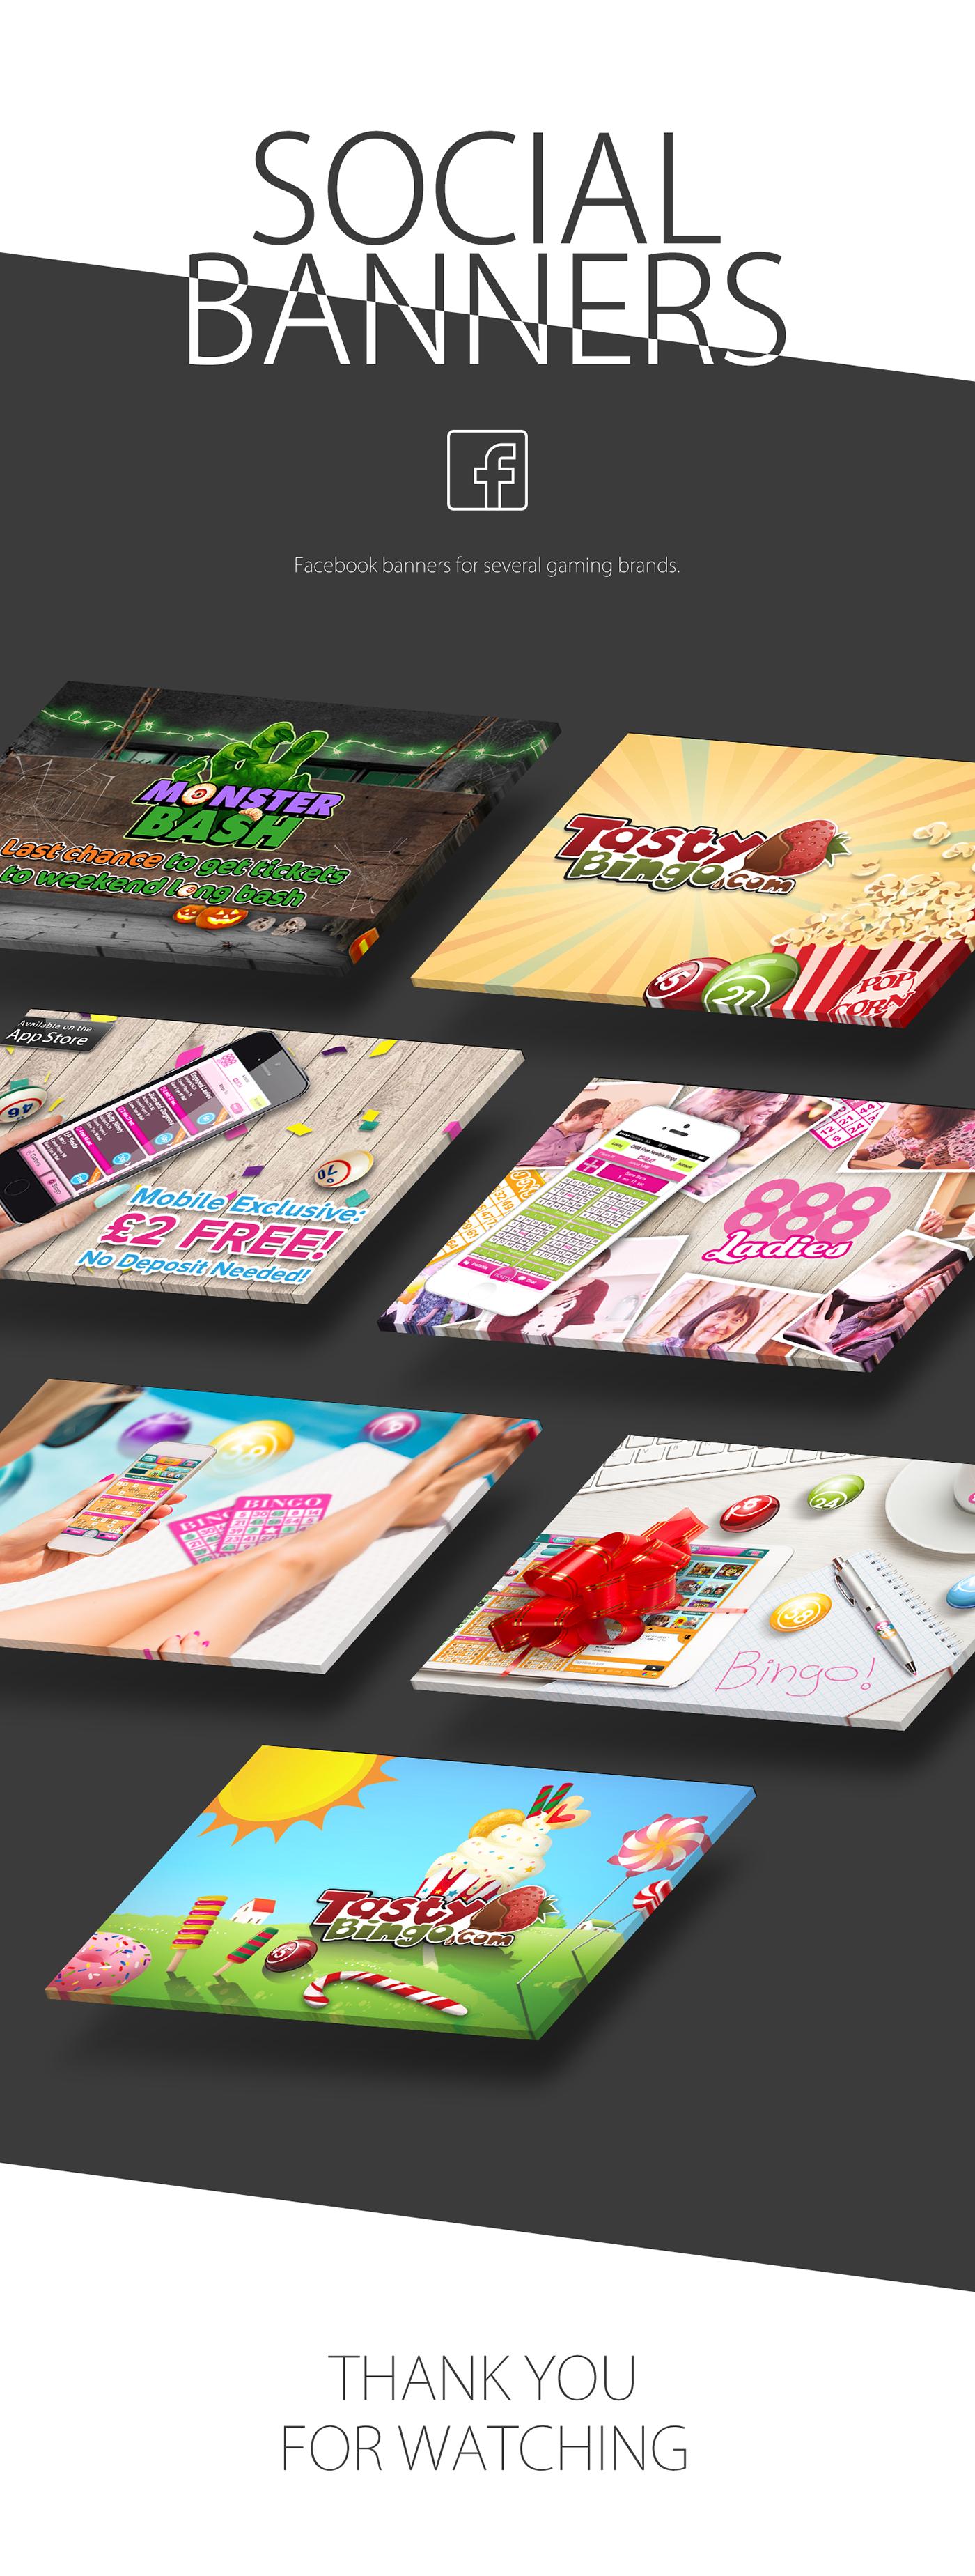 banners social Social banners facebook Gaming Games branding  colorful